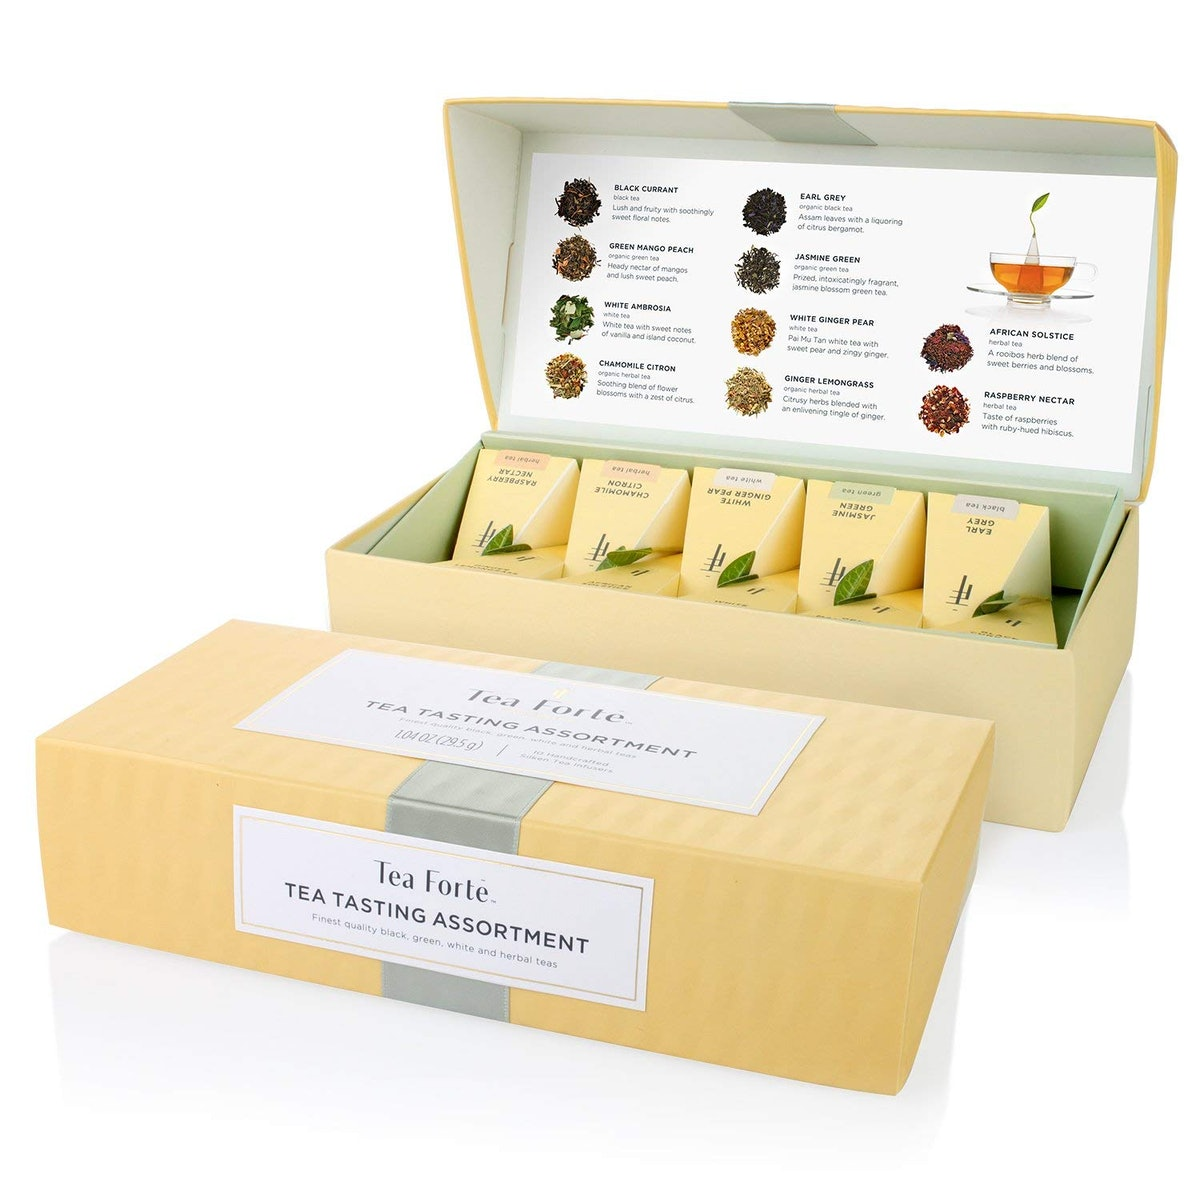 Tea Forte Tea Tasting Assortment Petite Presentation Box Tea Sampler (10-Pack)